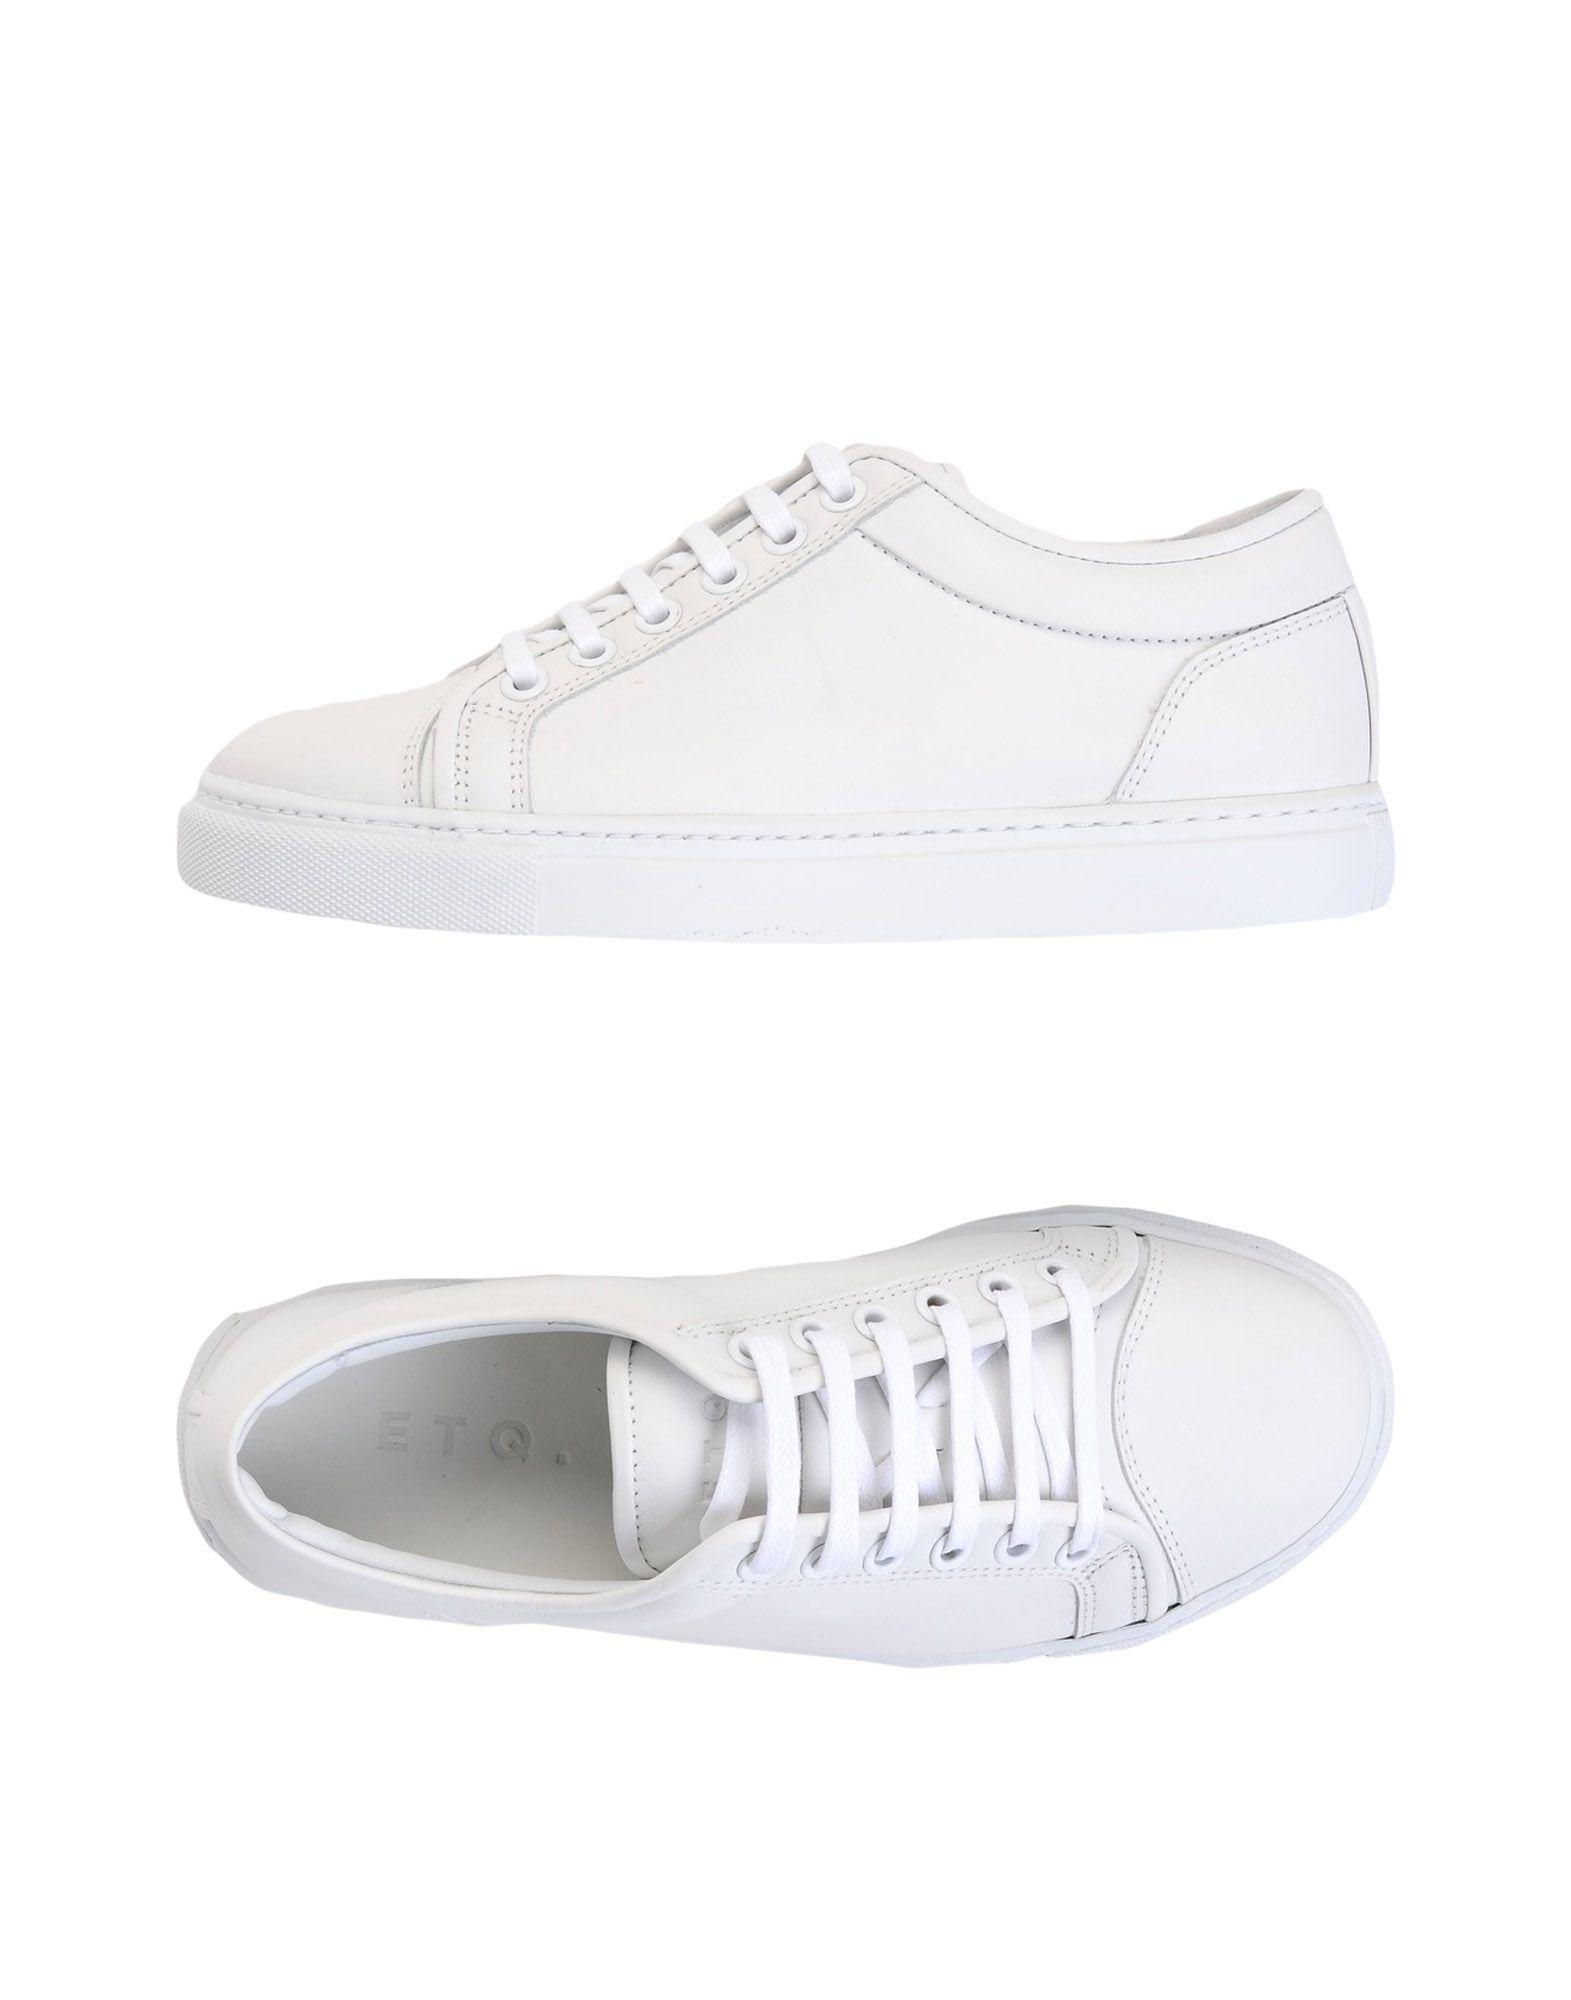 Etq Amsterdam Flat White  11449504UL Neue Schuhe